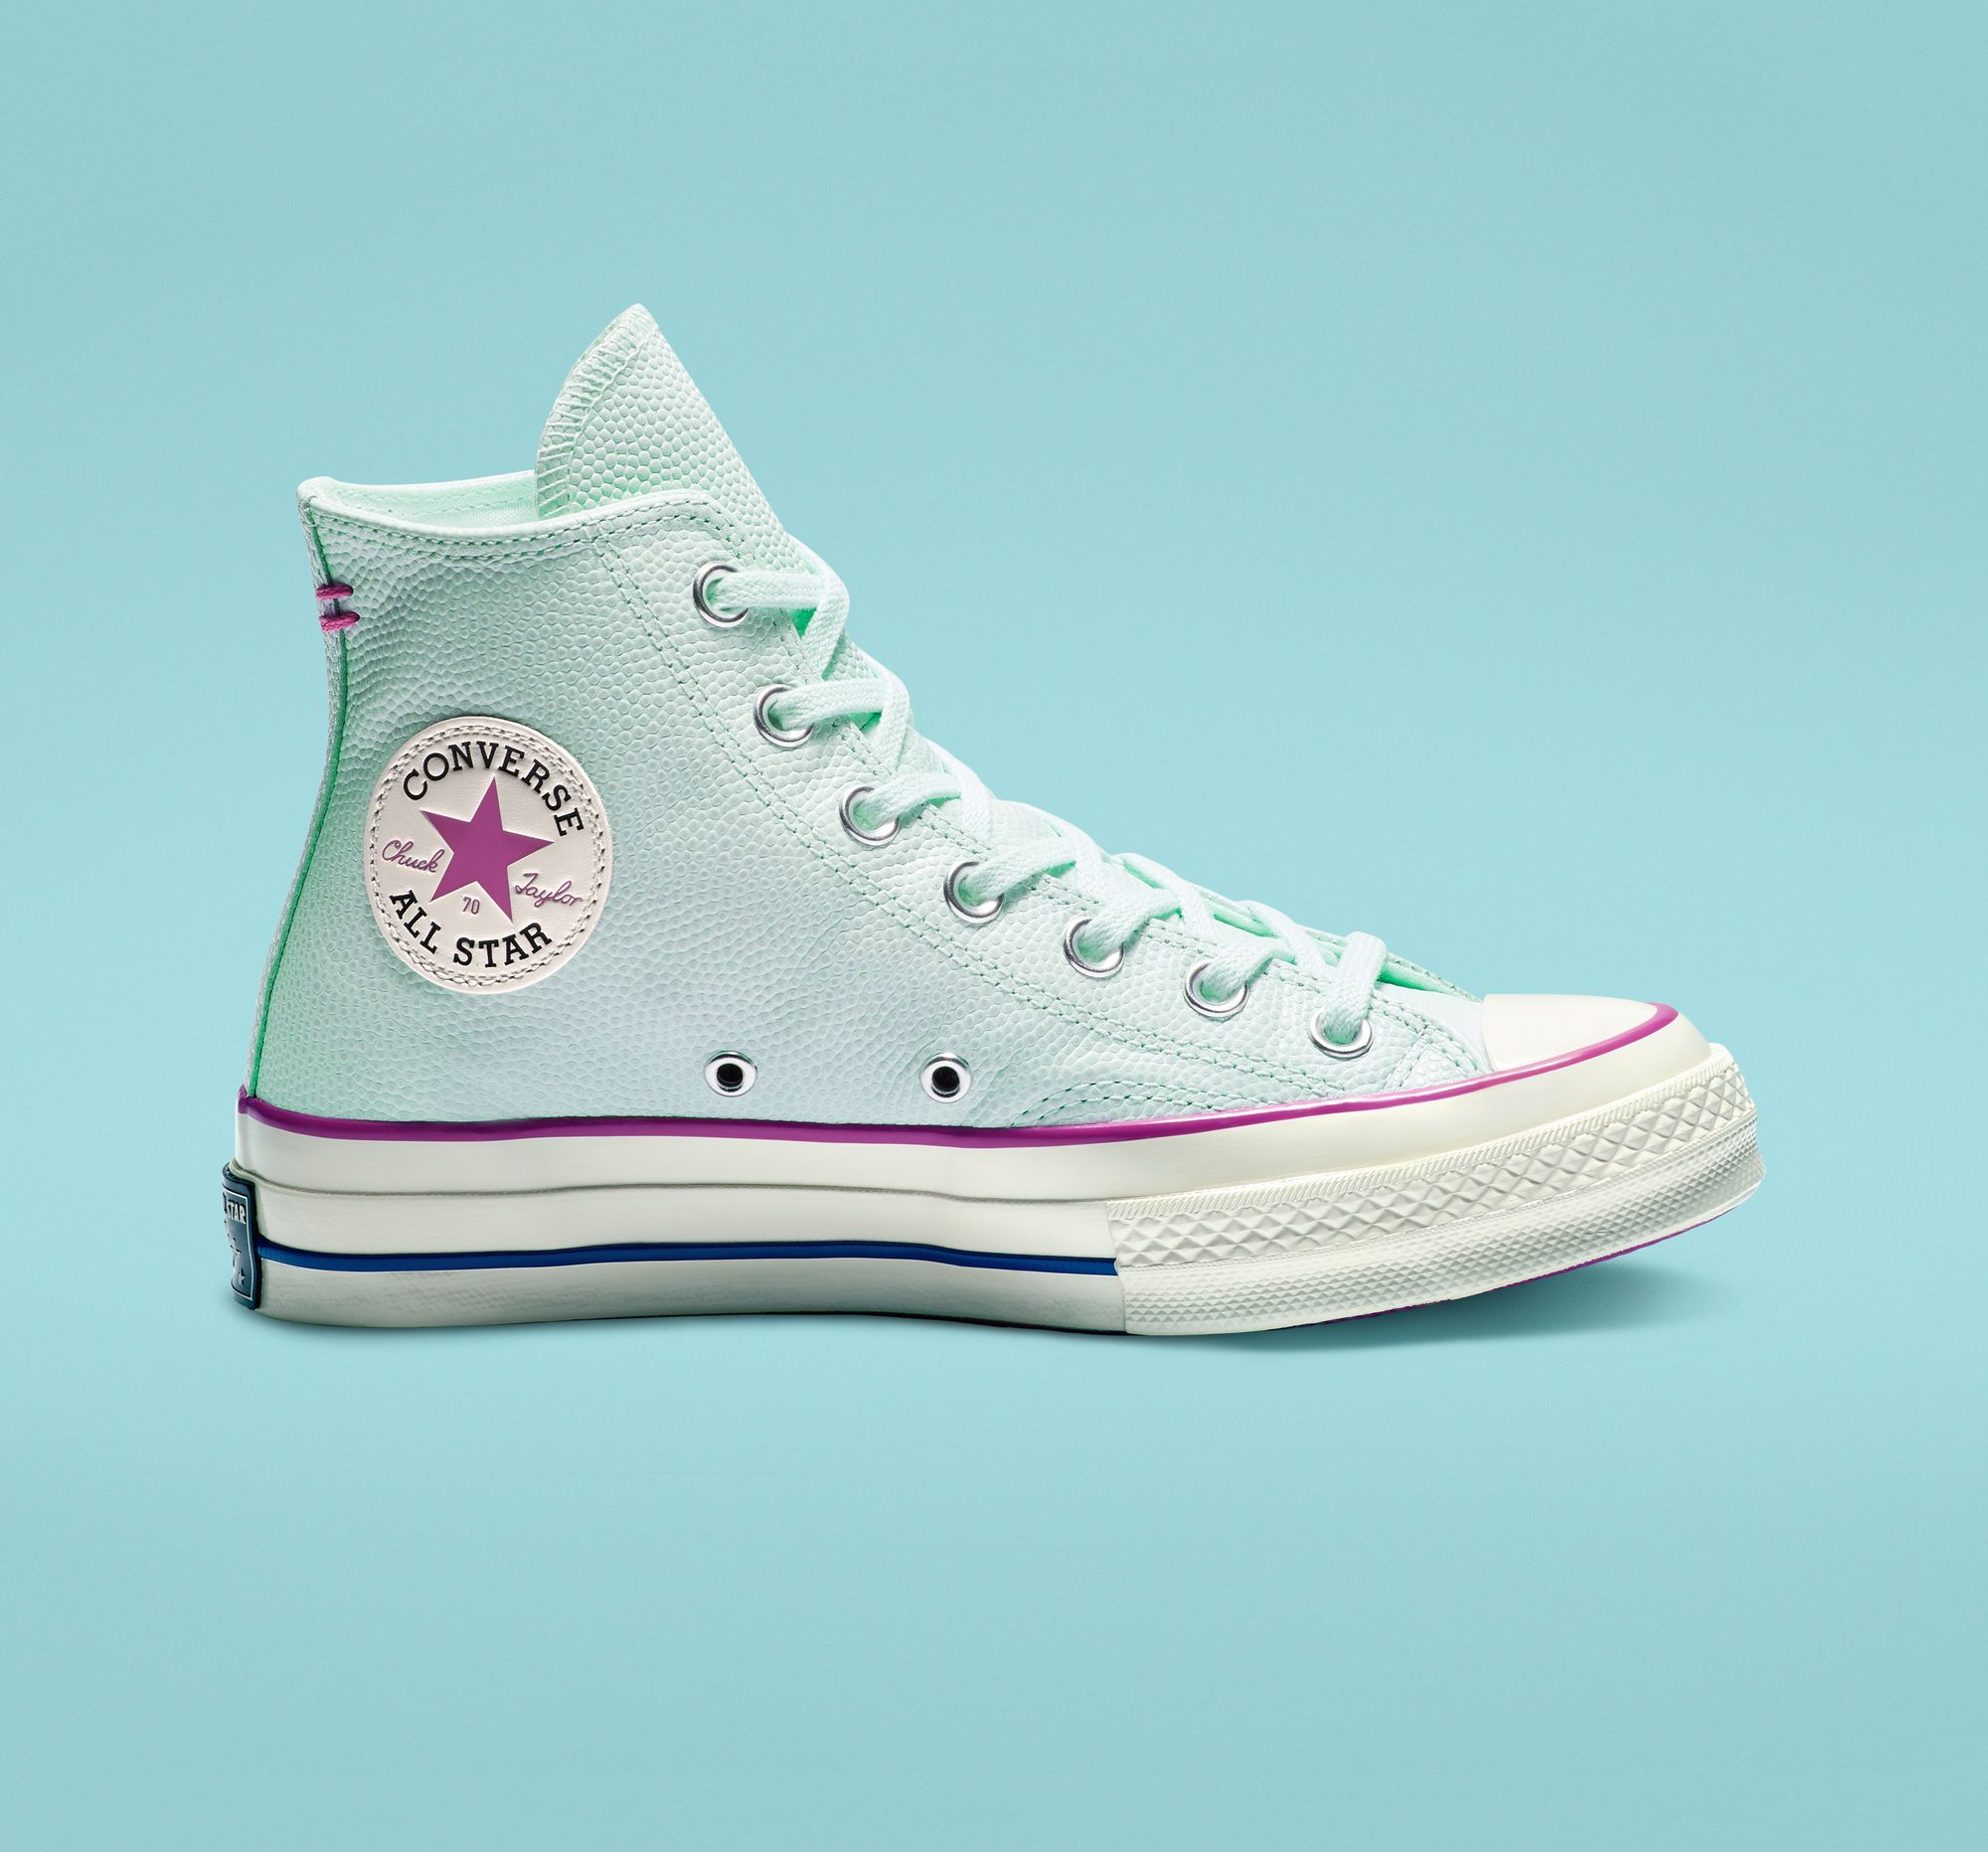 Chuck 70 Pink & Teal Pastel High Top Women's Shoe | Sneakers